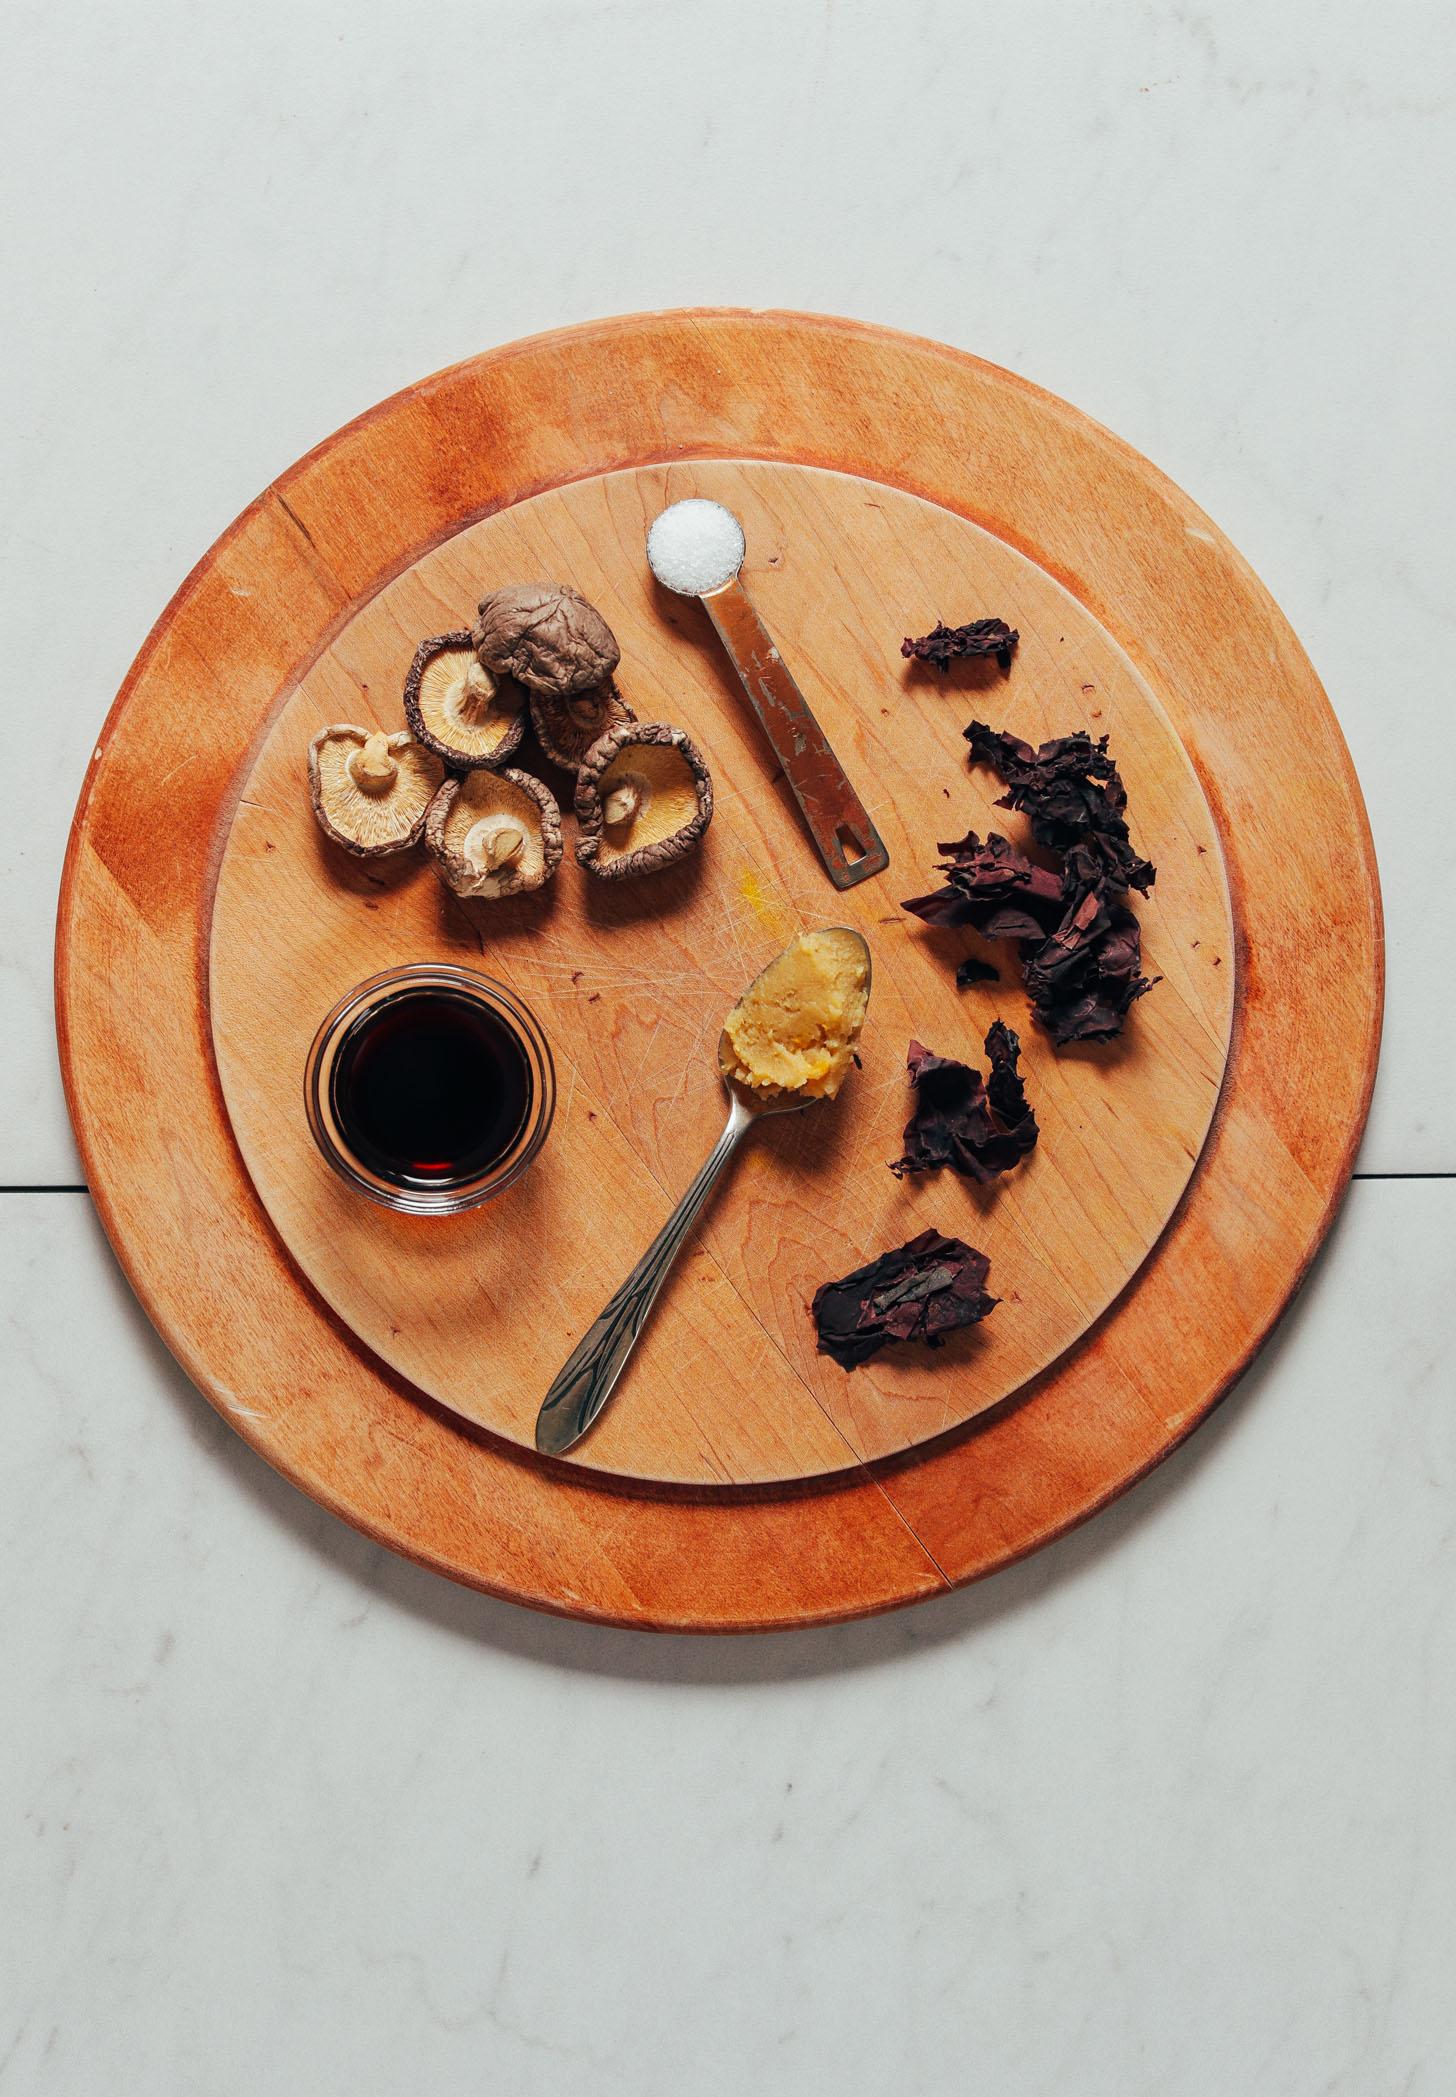 Dulse, shiitakes, miso, tamari, and salt for making vegetarian Fish Sauce